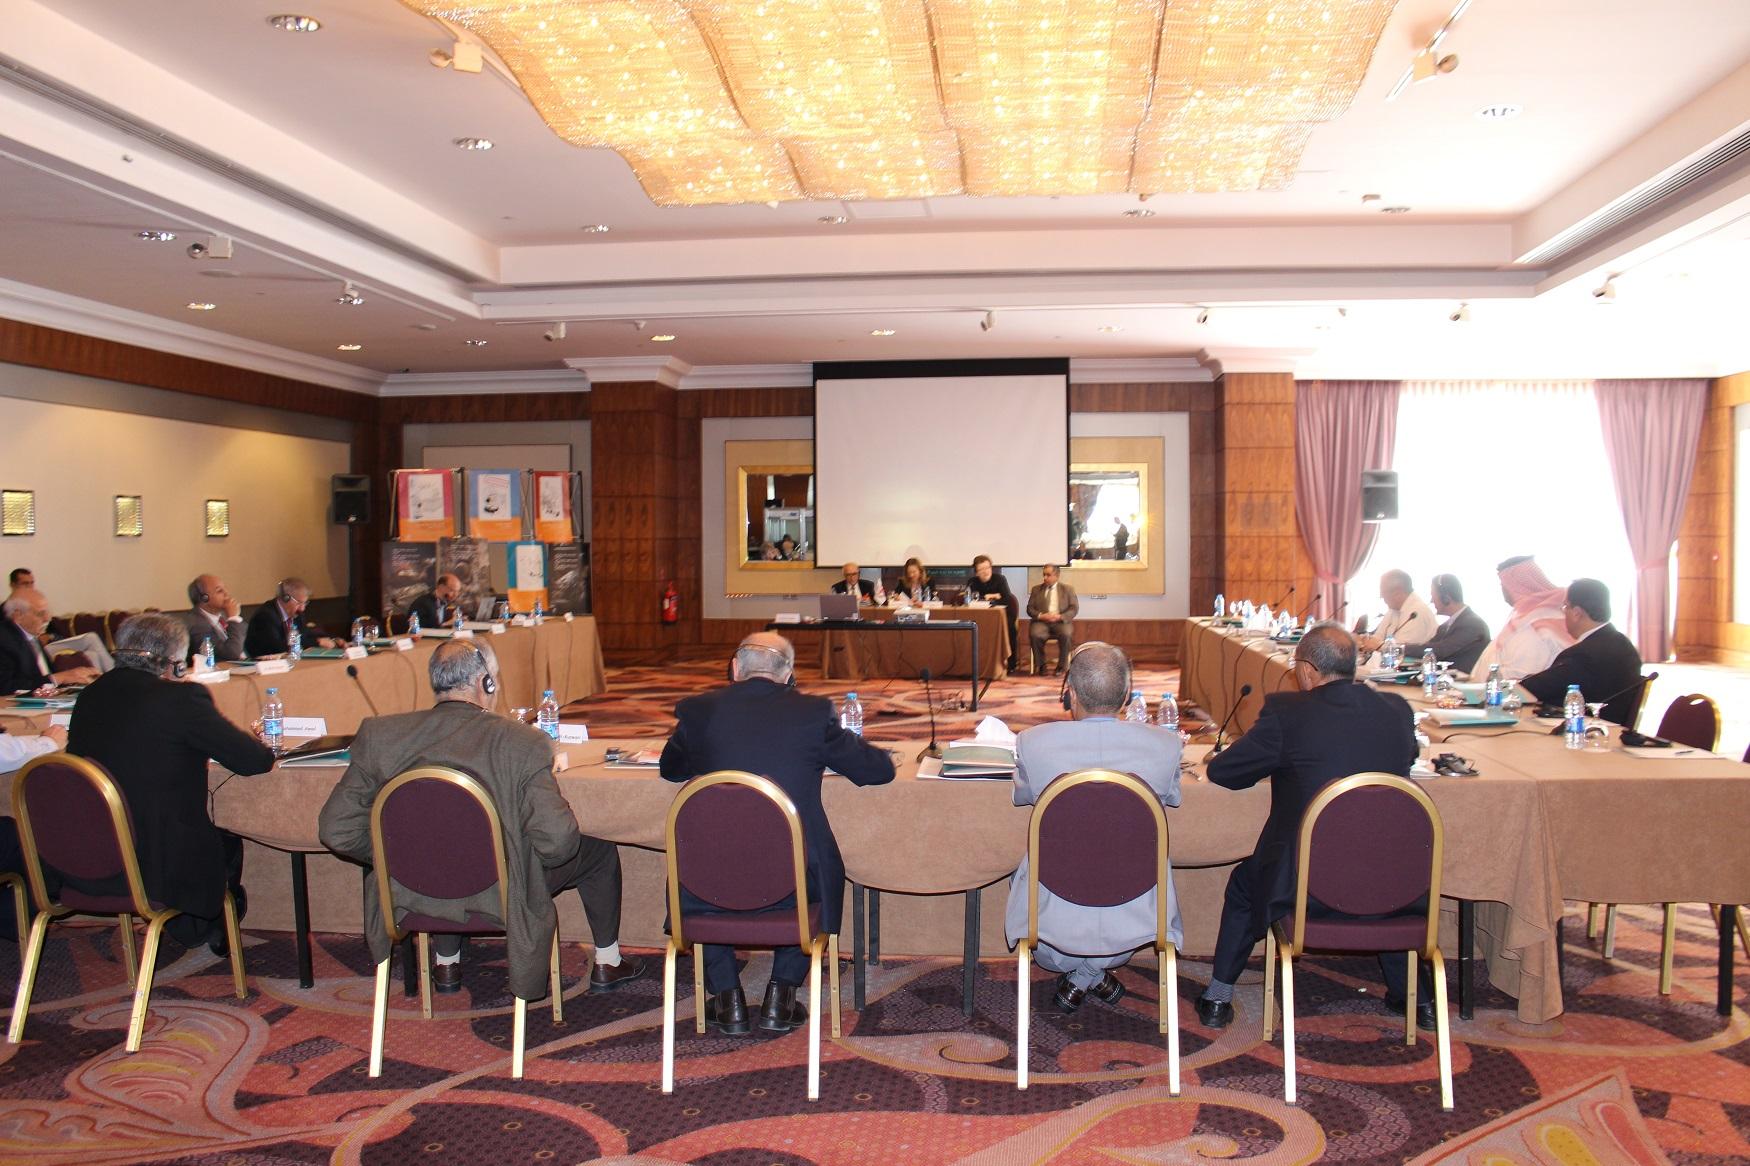 Jordan: Medical associations discuss health care in